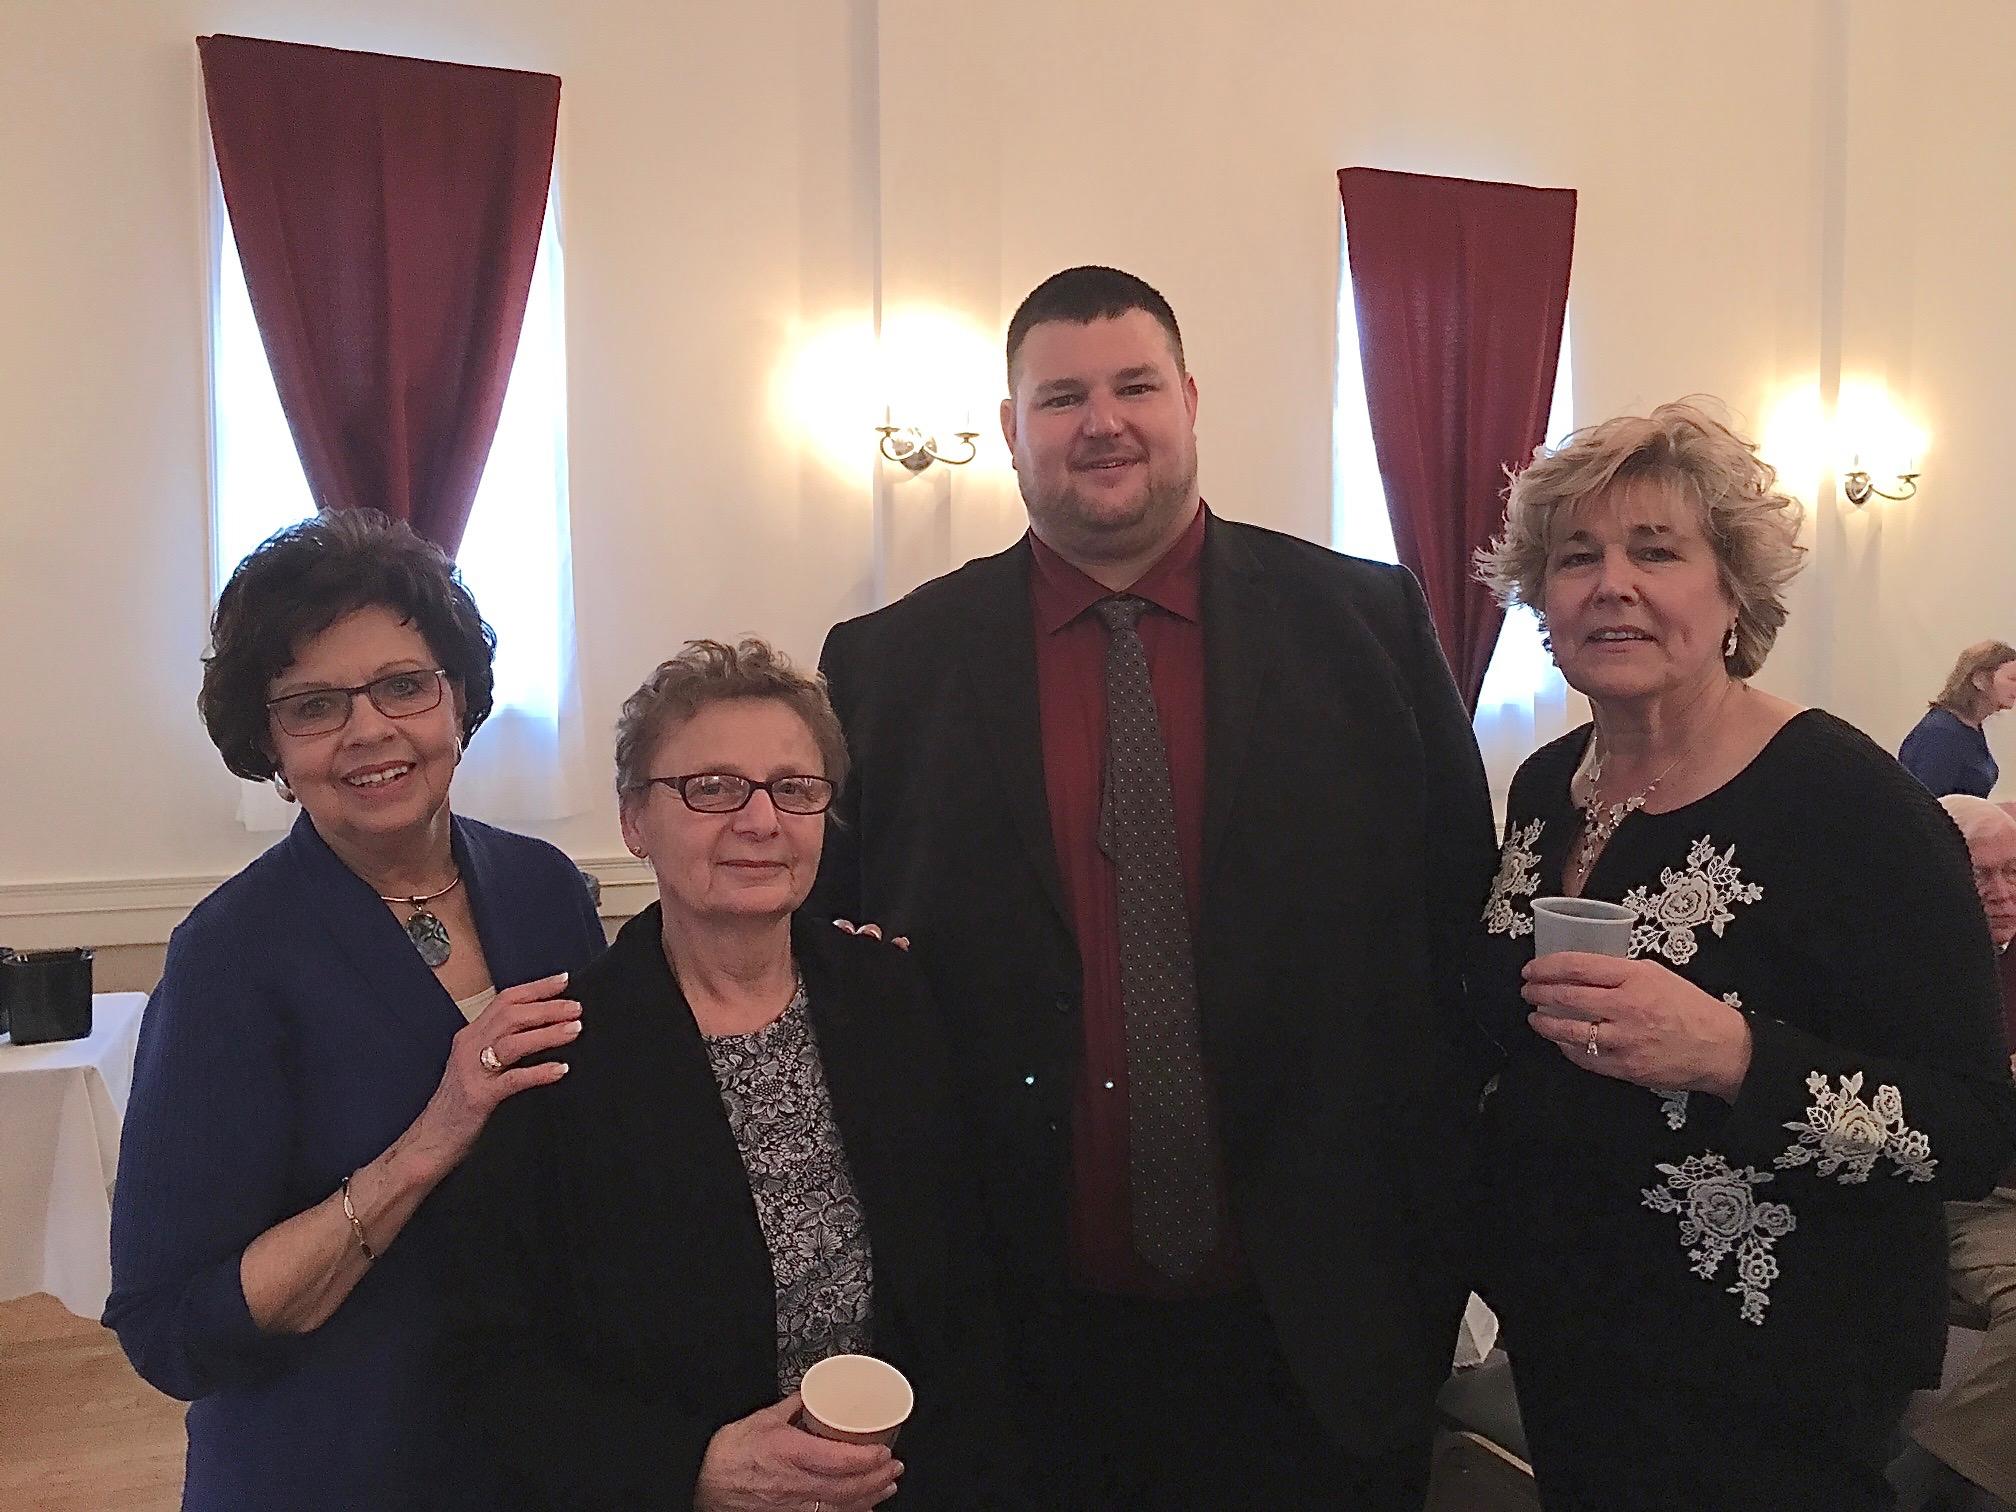 Kathy, Belinda, Carol's son, & Carol